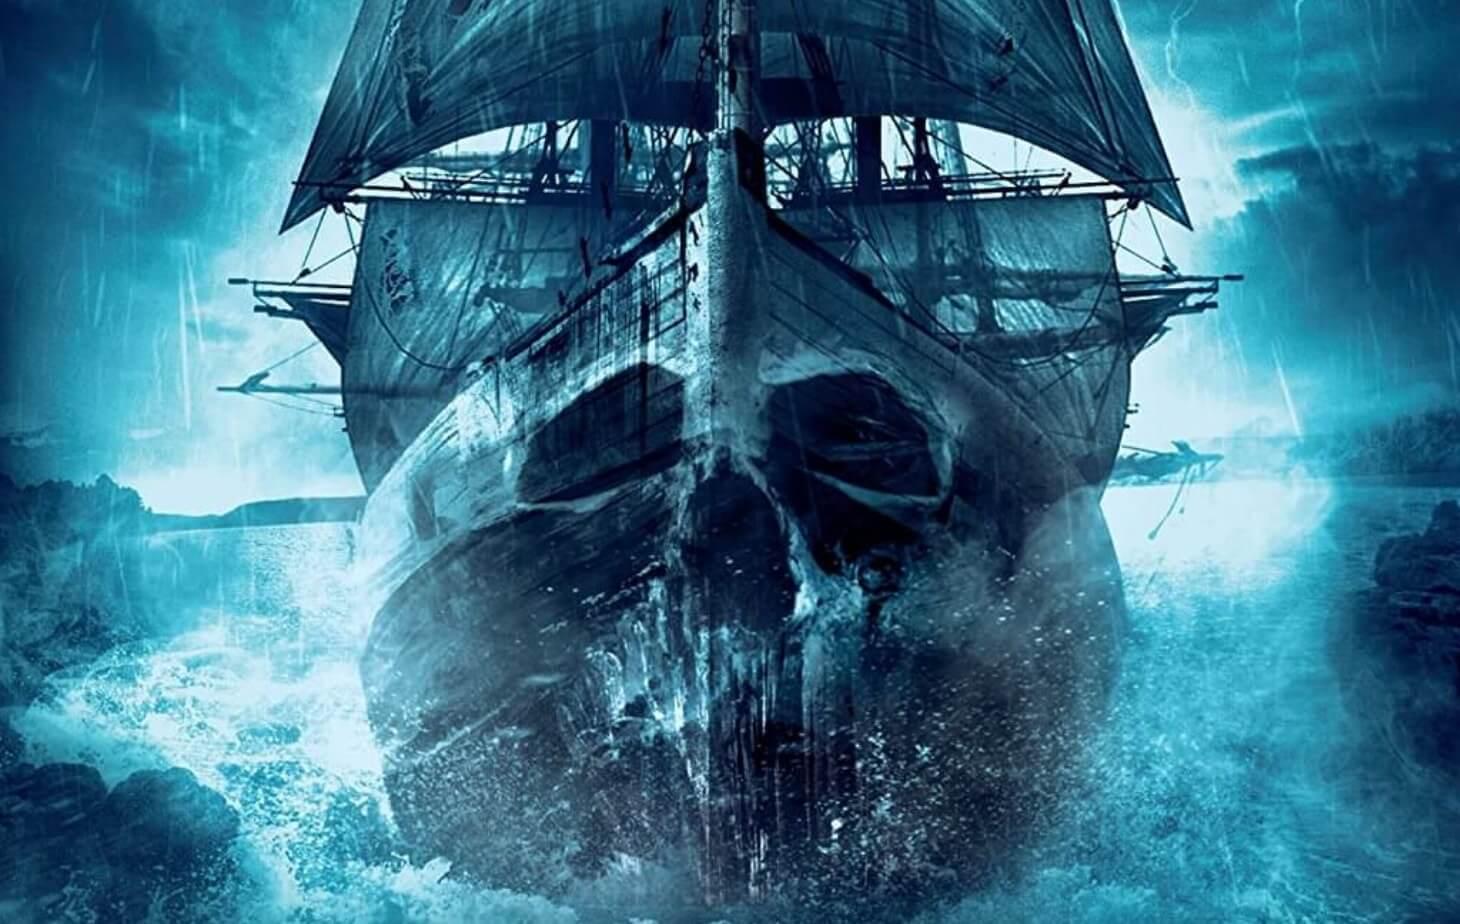 ghost-ship-dvd2-1.jpg